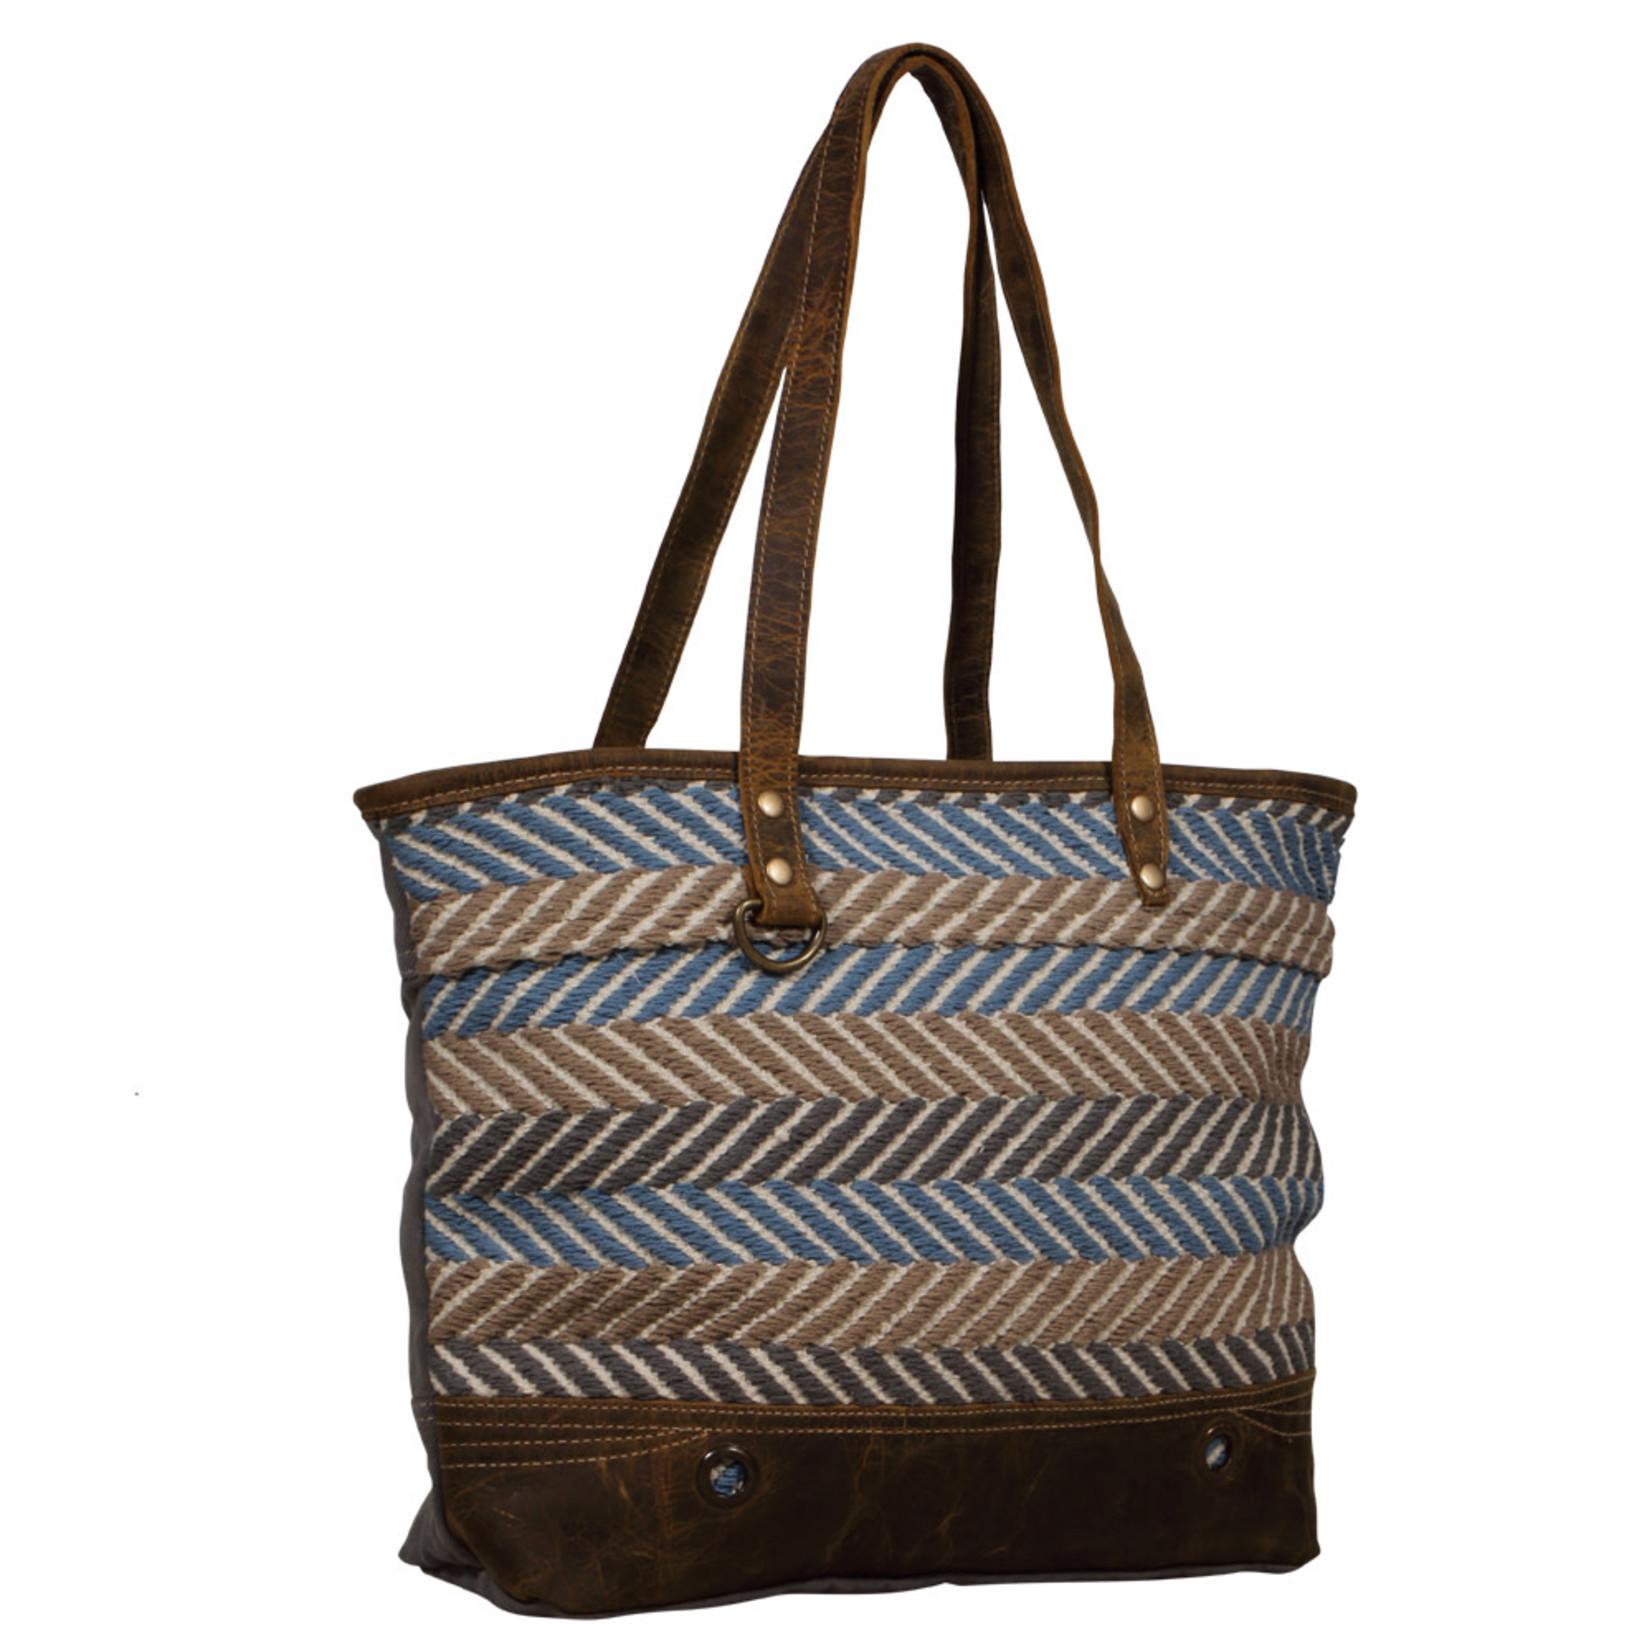 Myra Bags S-2109 Extravagant Tote Bag